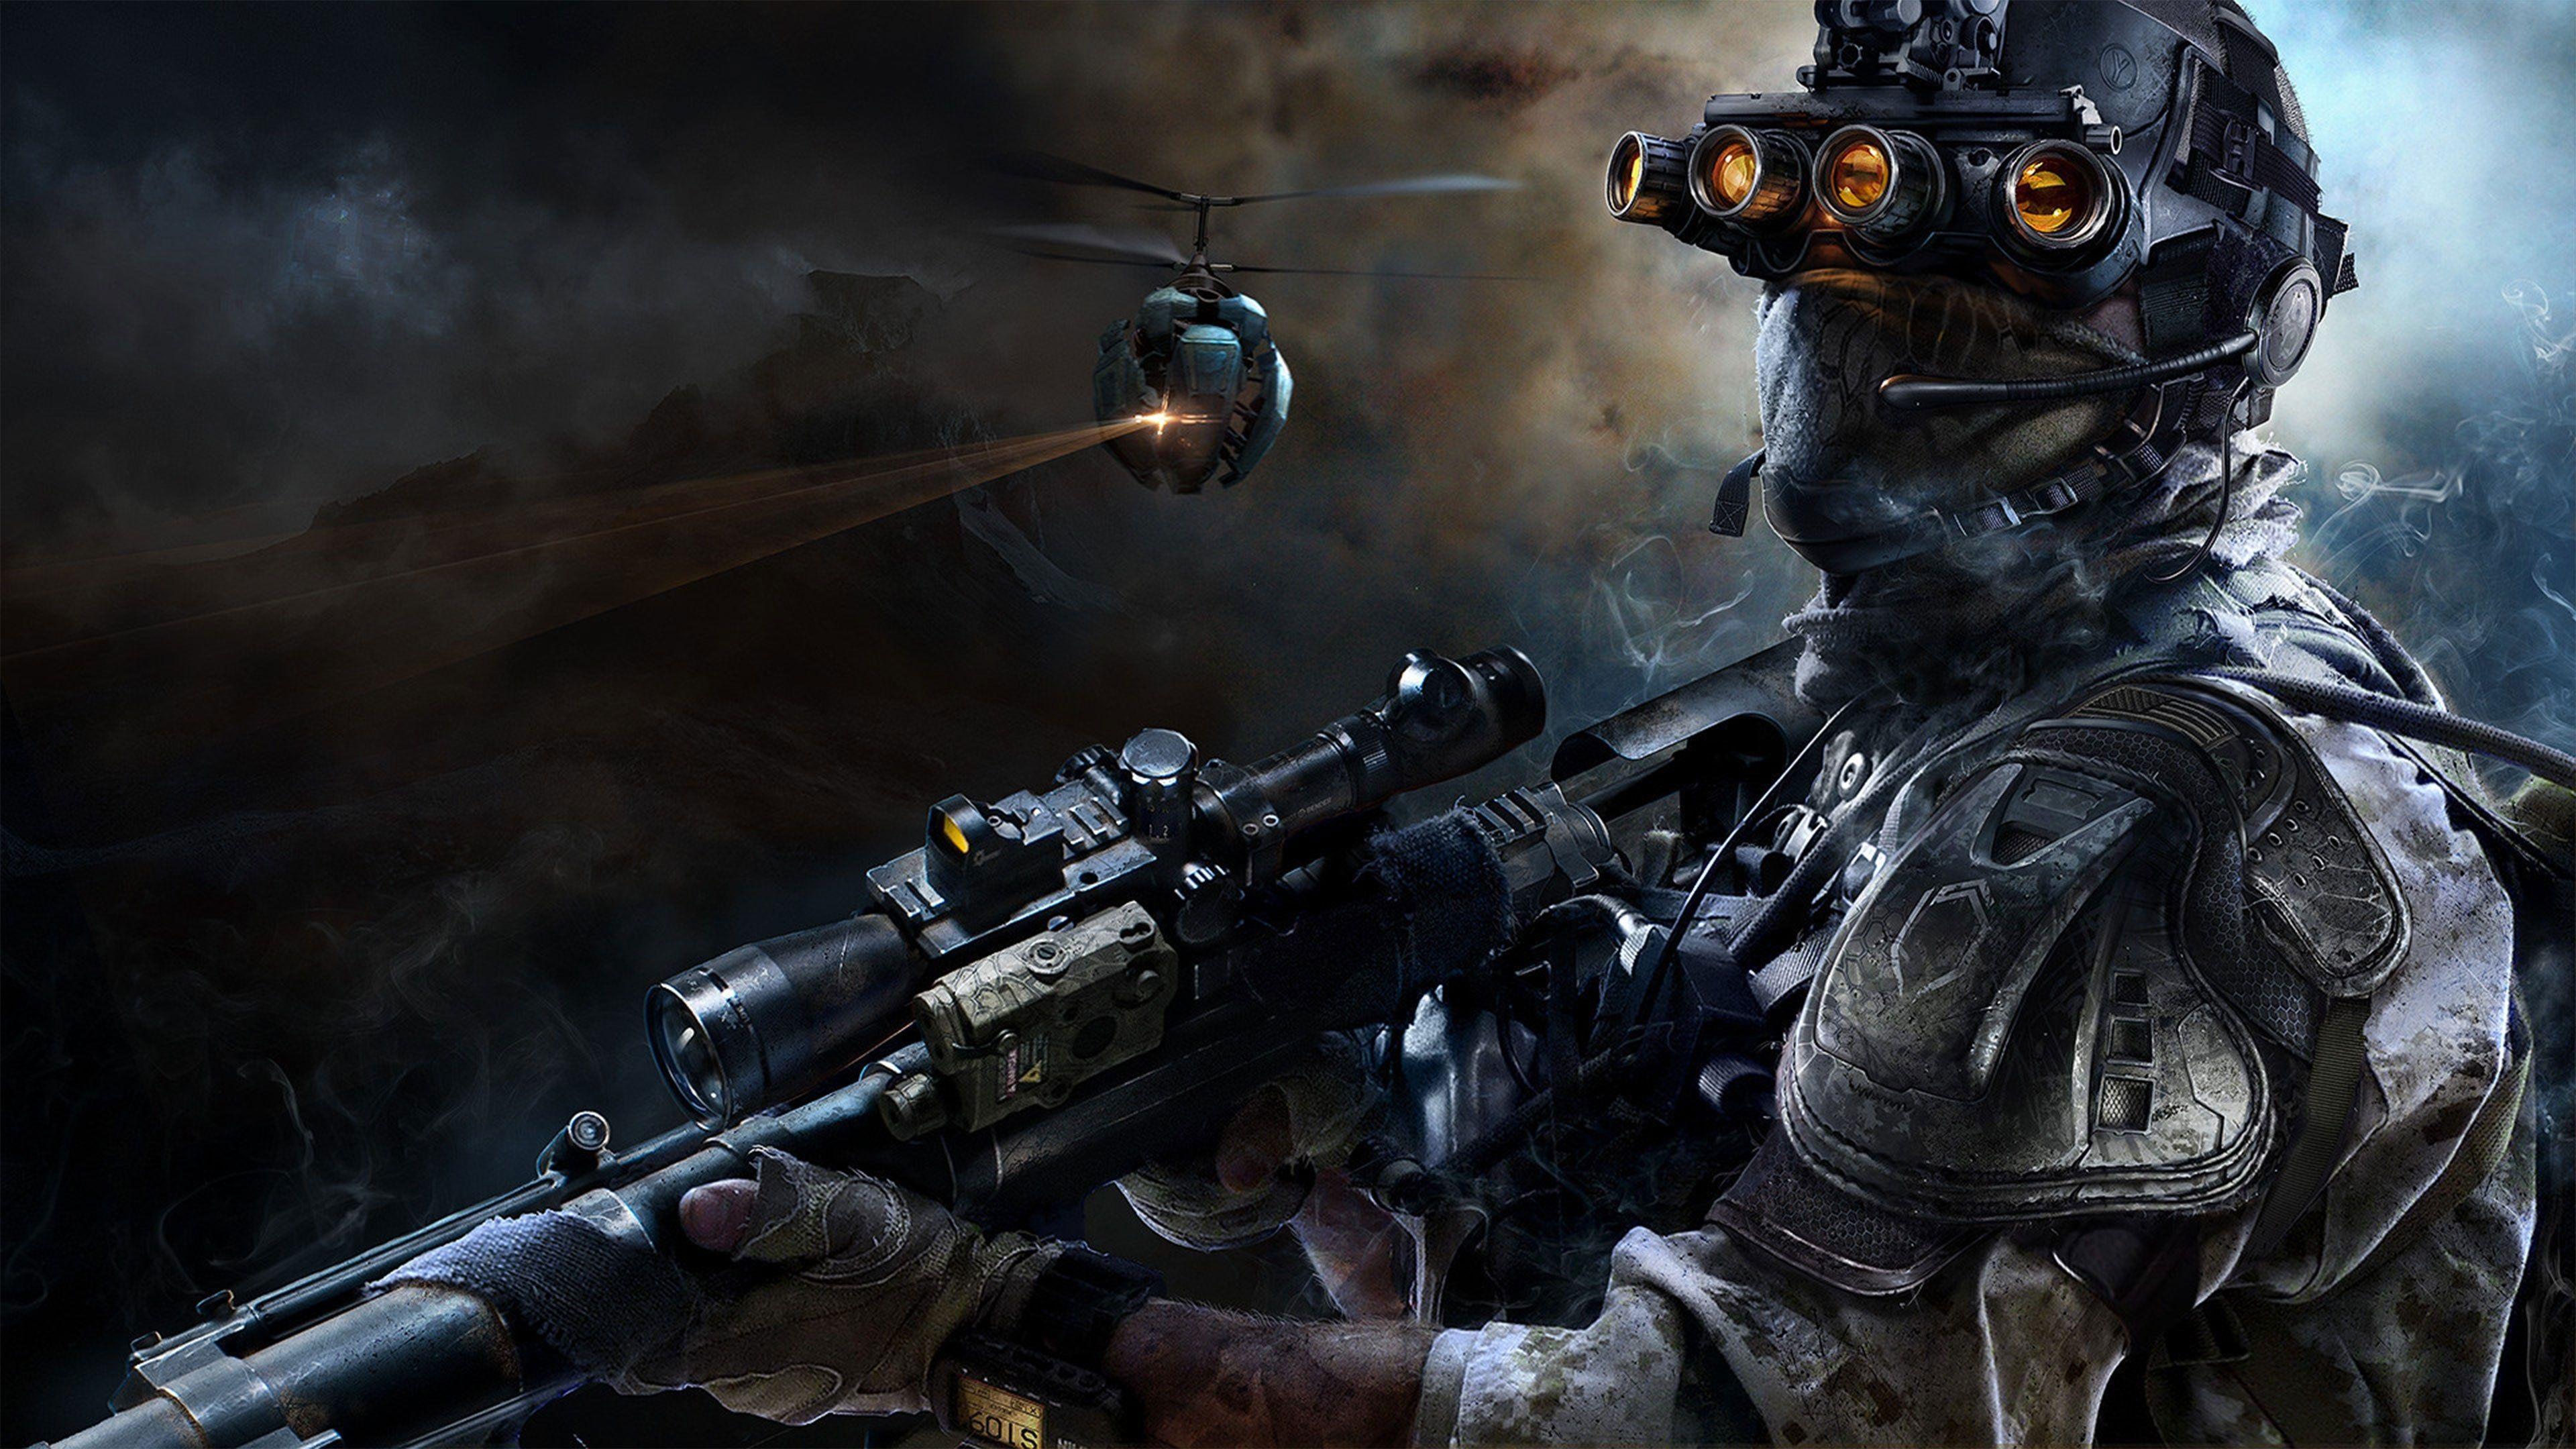 3840x2160 Sniper Ghost Warrior 3 4k Wallpaper Pc Desktop Sniper Ghost Warrior 3